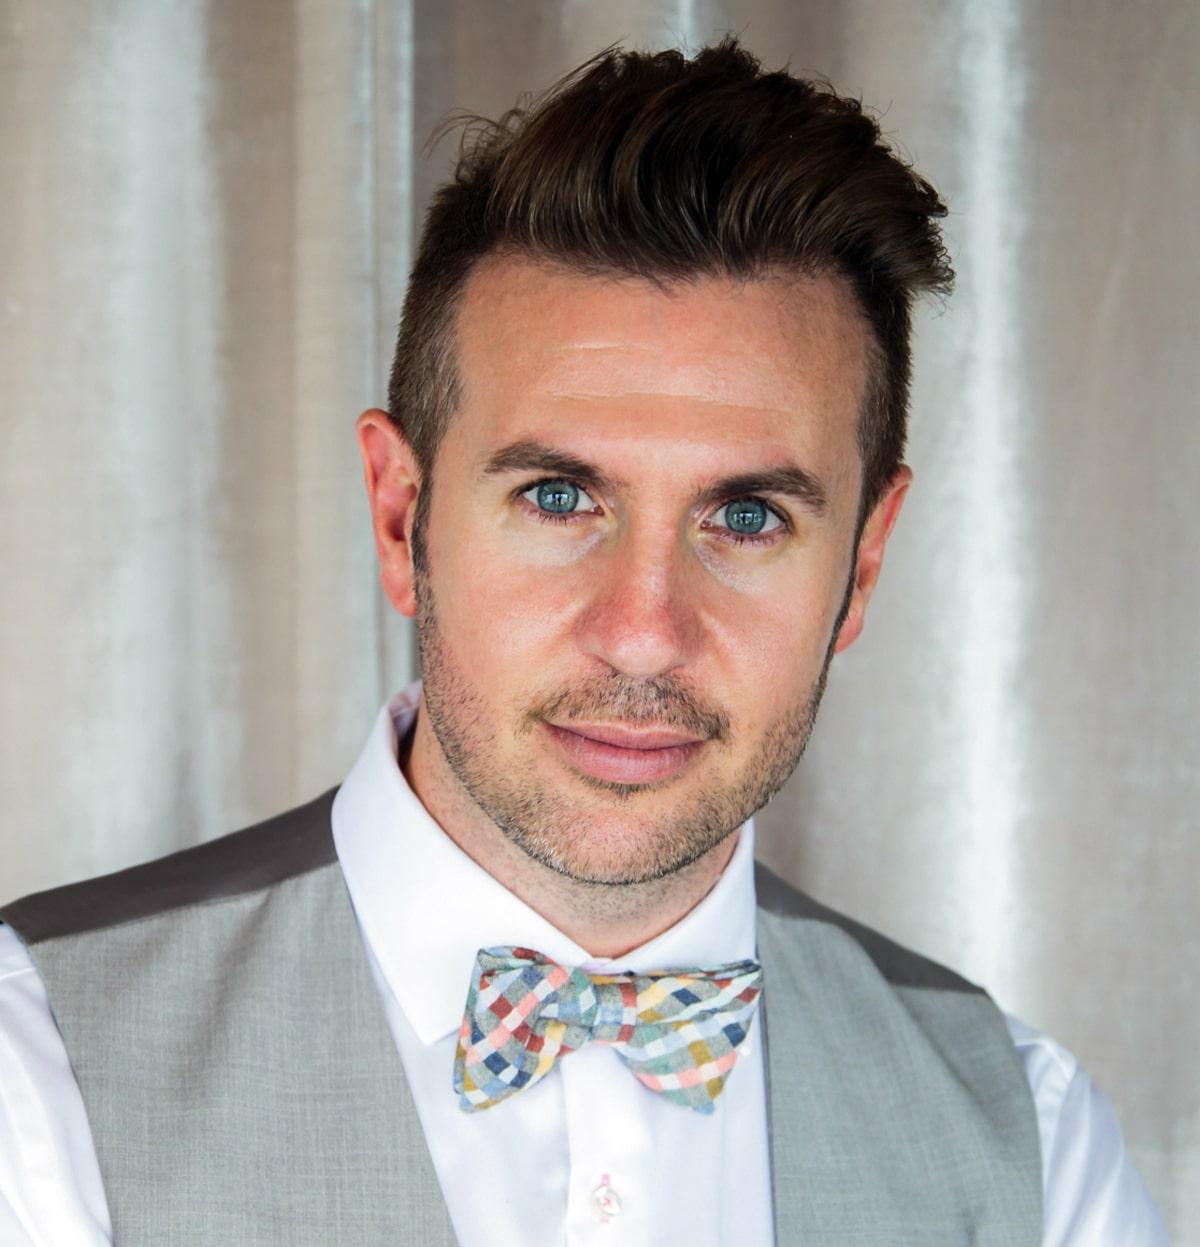 Marc Checkley New Zealand Kiwi TV Video Presenter Wine Expert Travel Speaker host at Great British Presenters